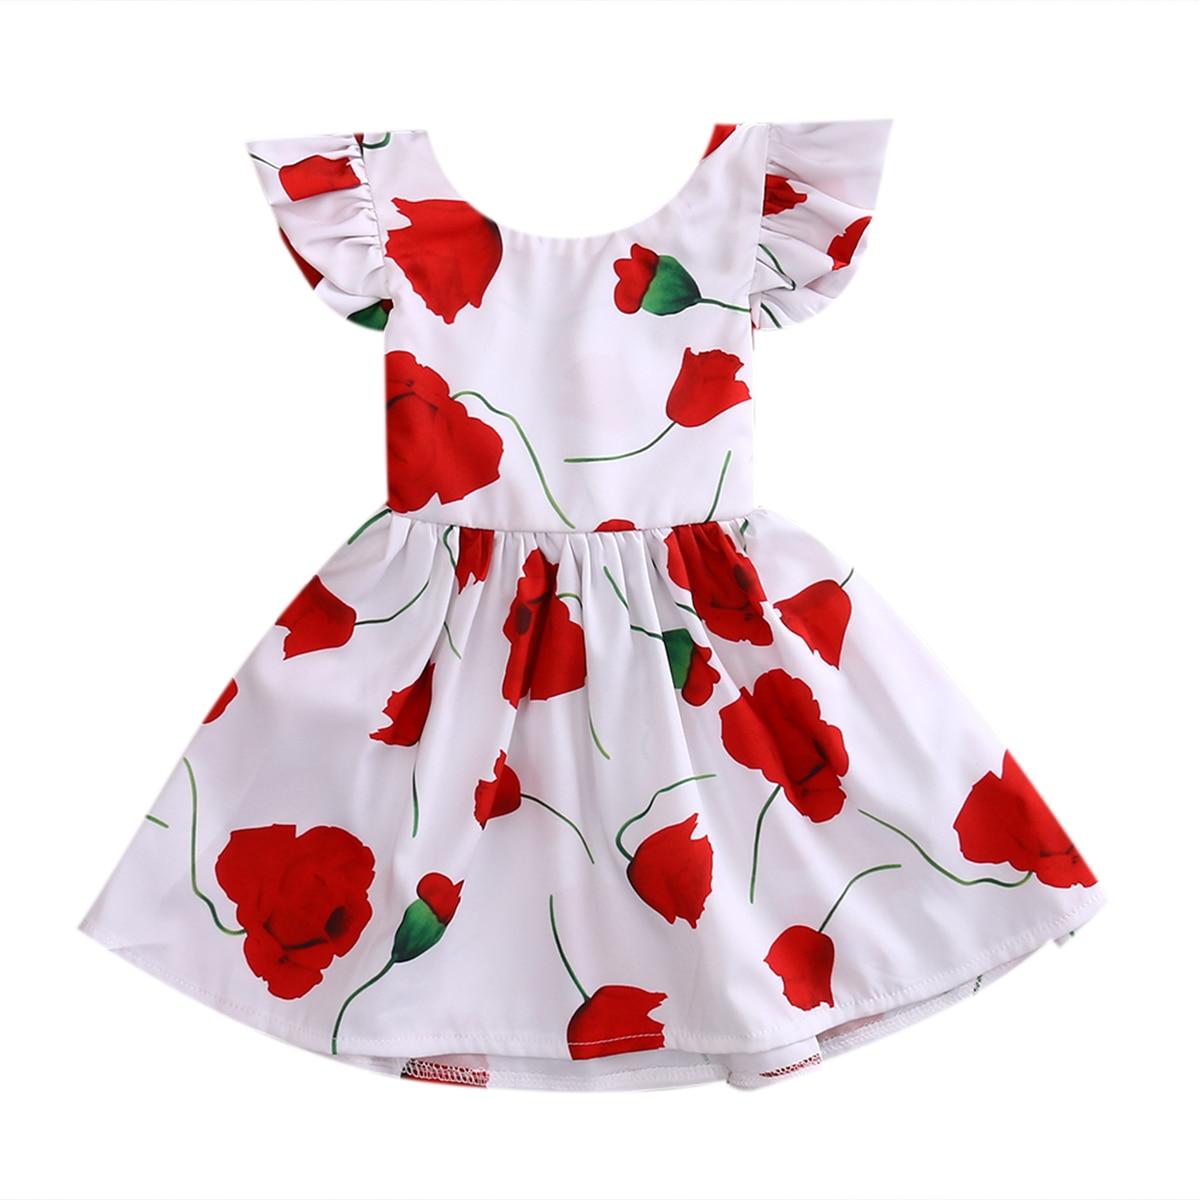 Blume Mädchen Prinzessin Kleid Kind Baby Partei Pageant Floral Rote ...